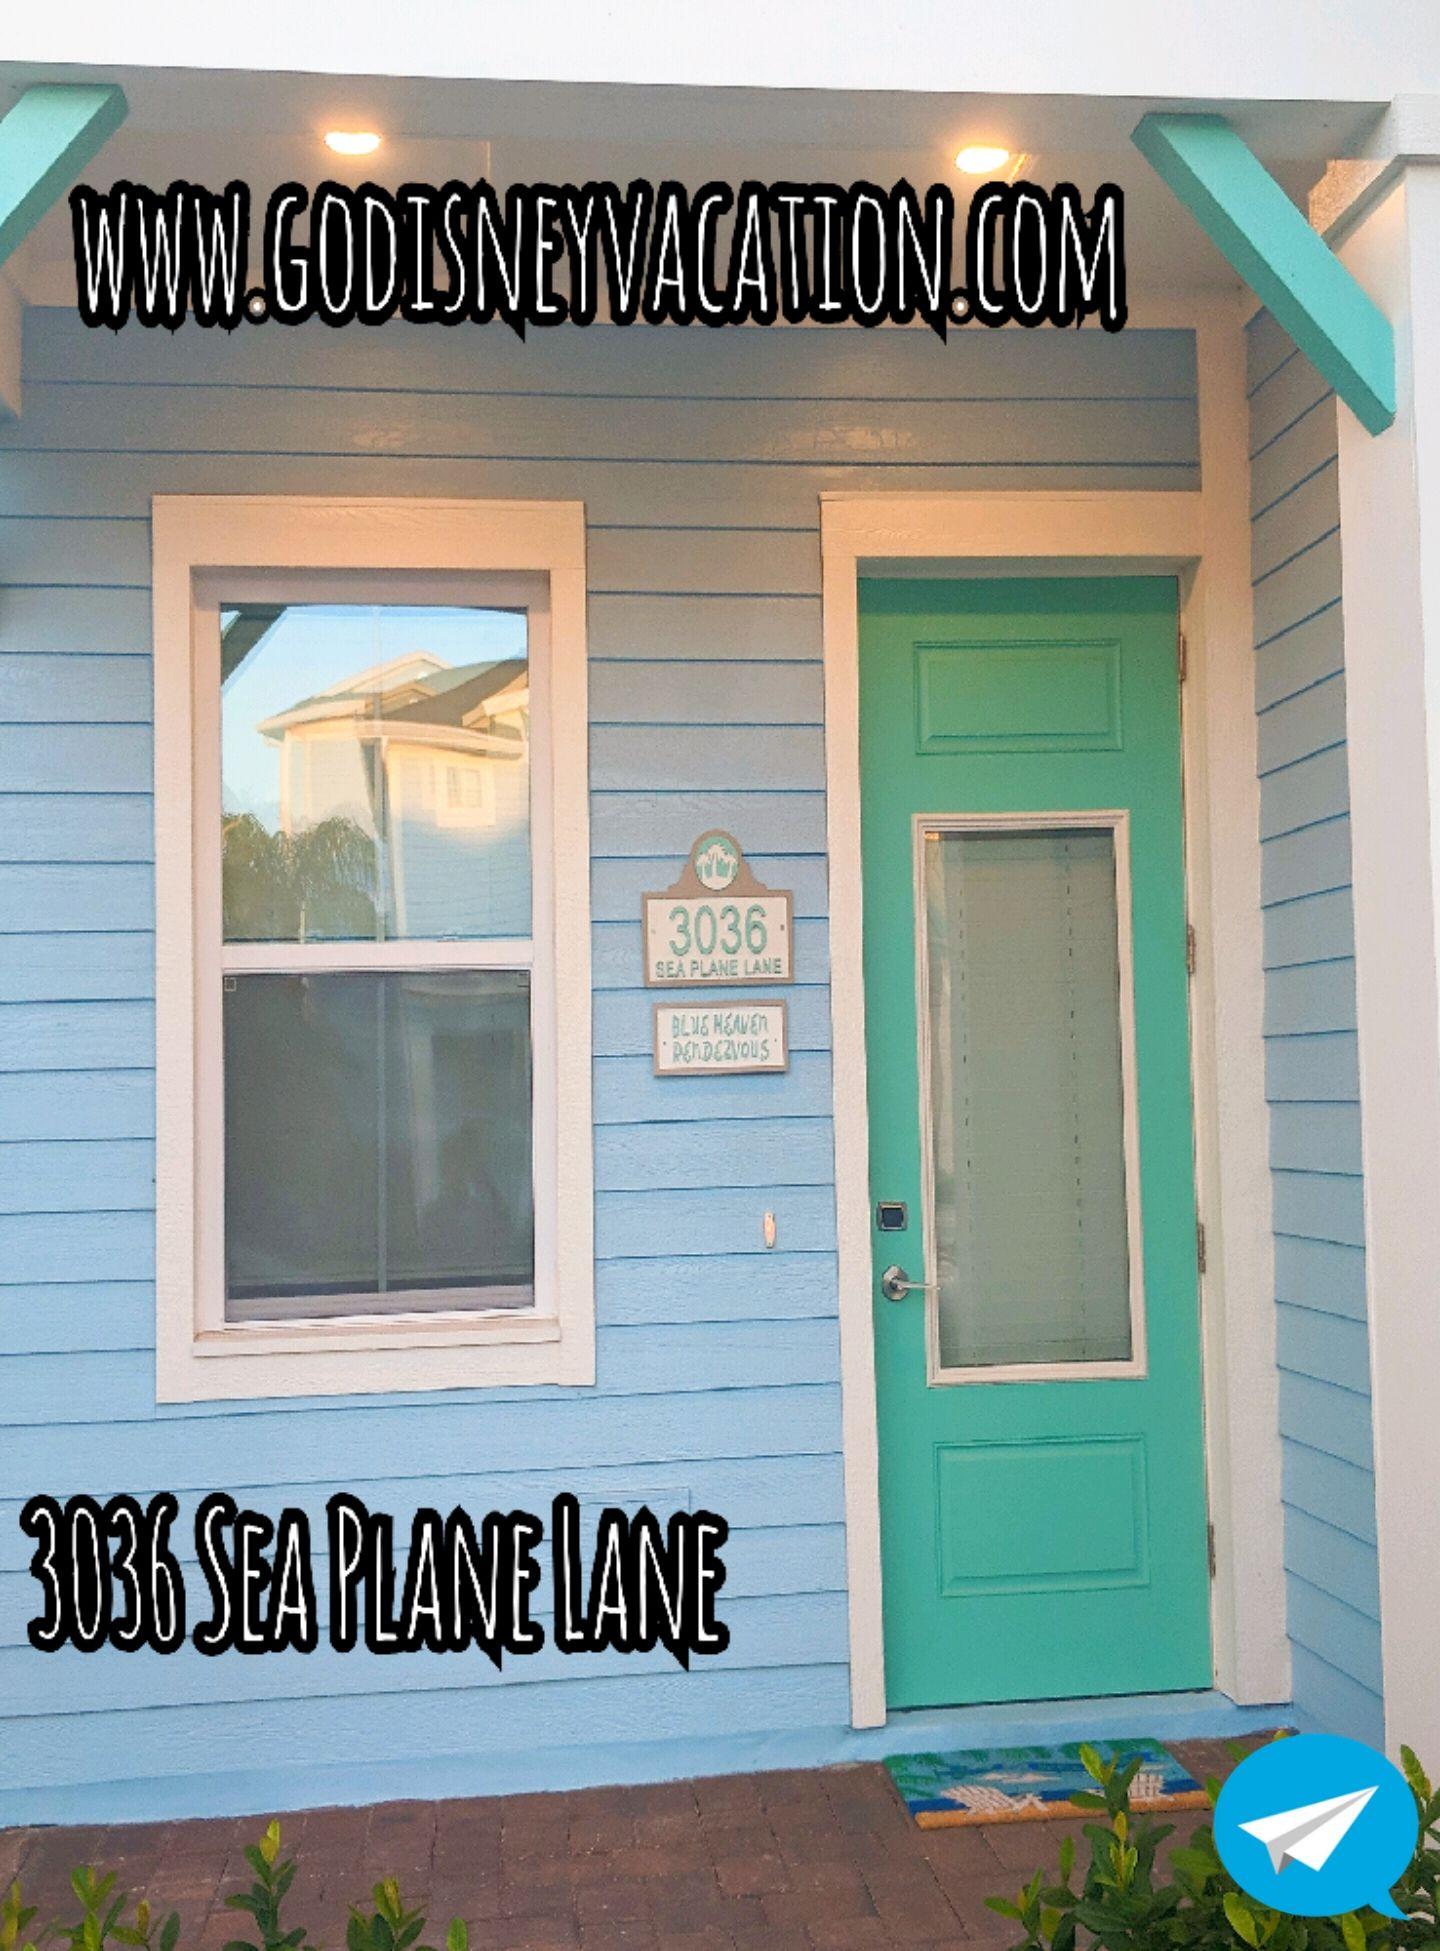 Margaritaville Resort Orlando Florida brand new cottages